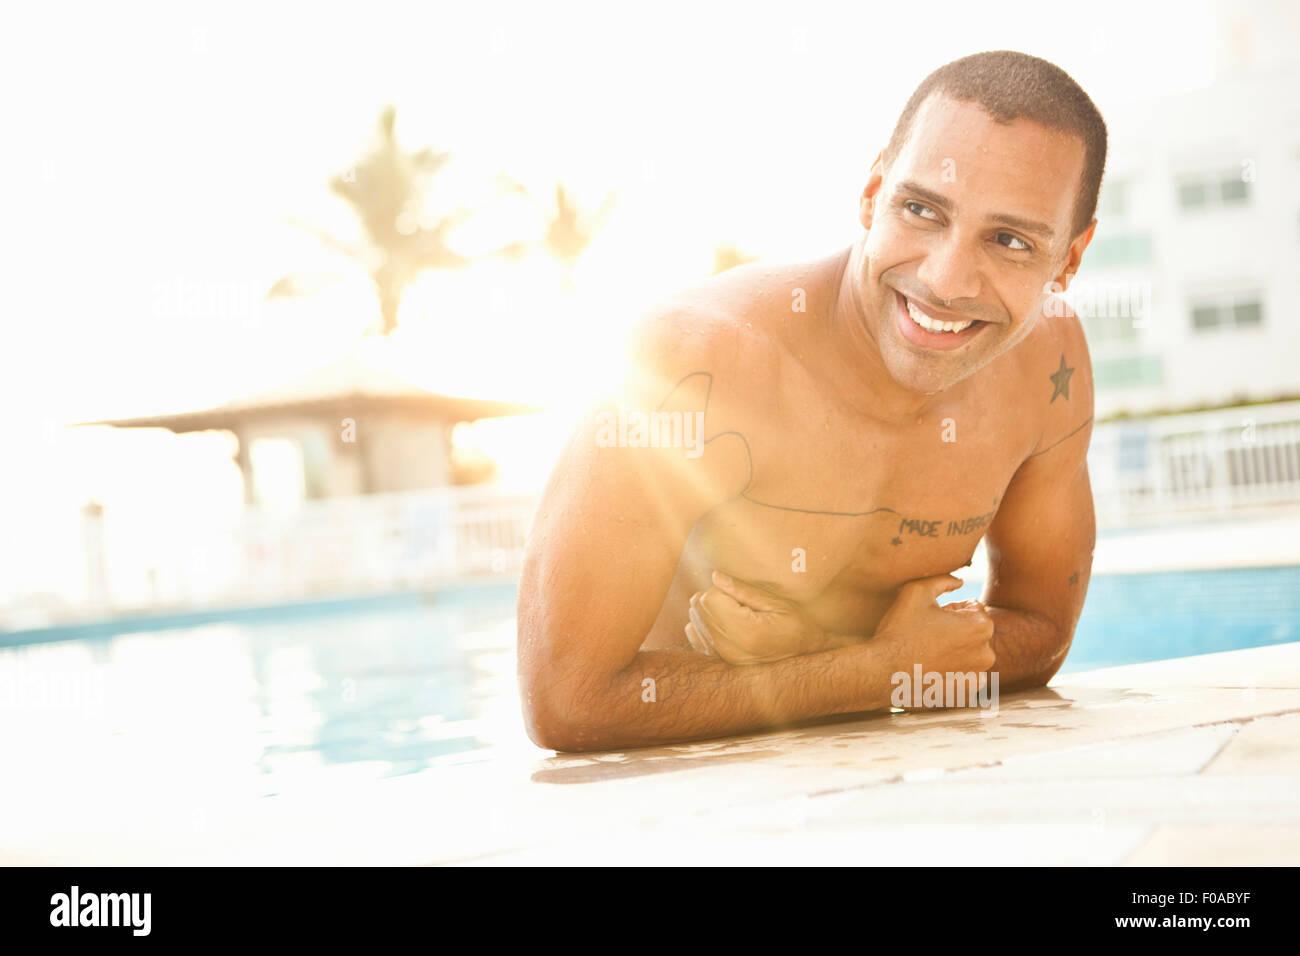 Mid adult man standing in sunlit hotel swimming pool, Rio De Janeiro, Brazil - Stock Image